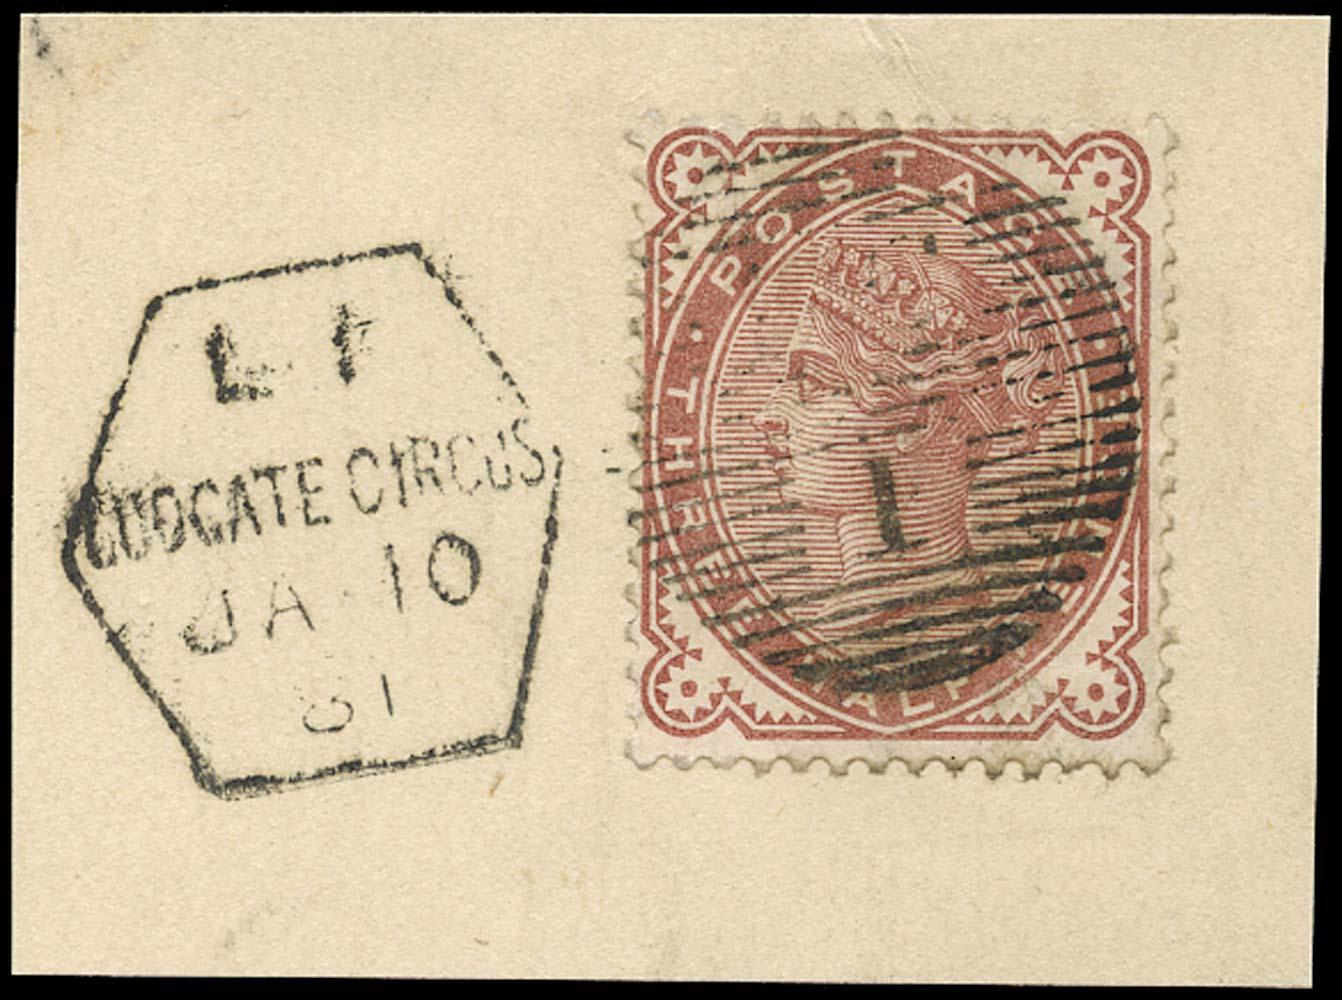 GB 1880  SG167 Used Ludgate circus Late fee duplex